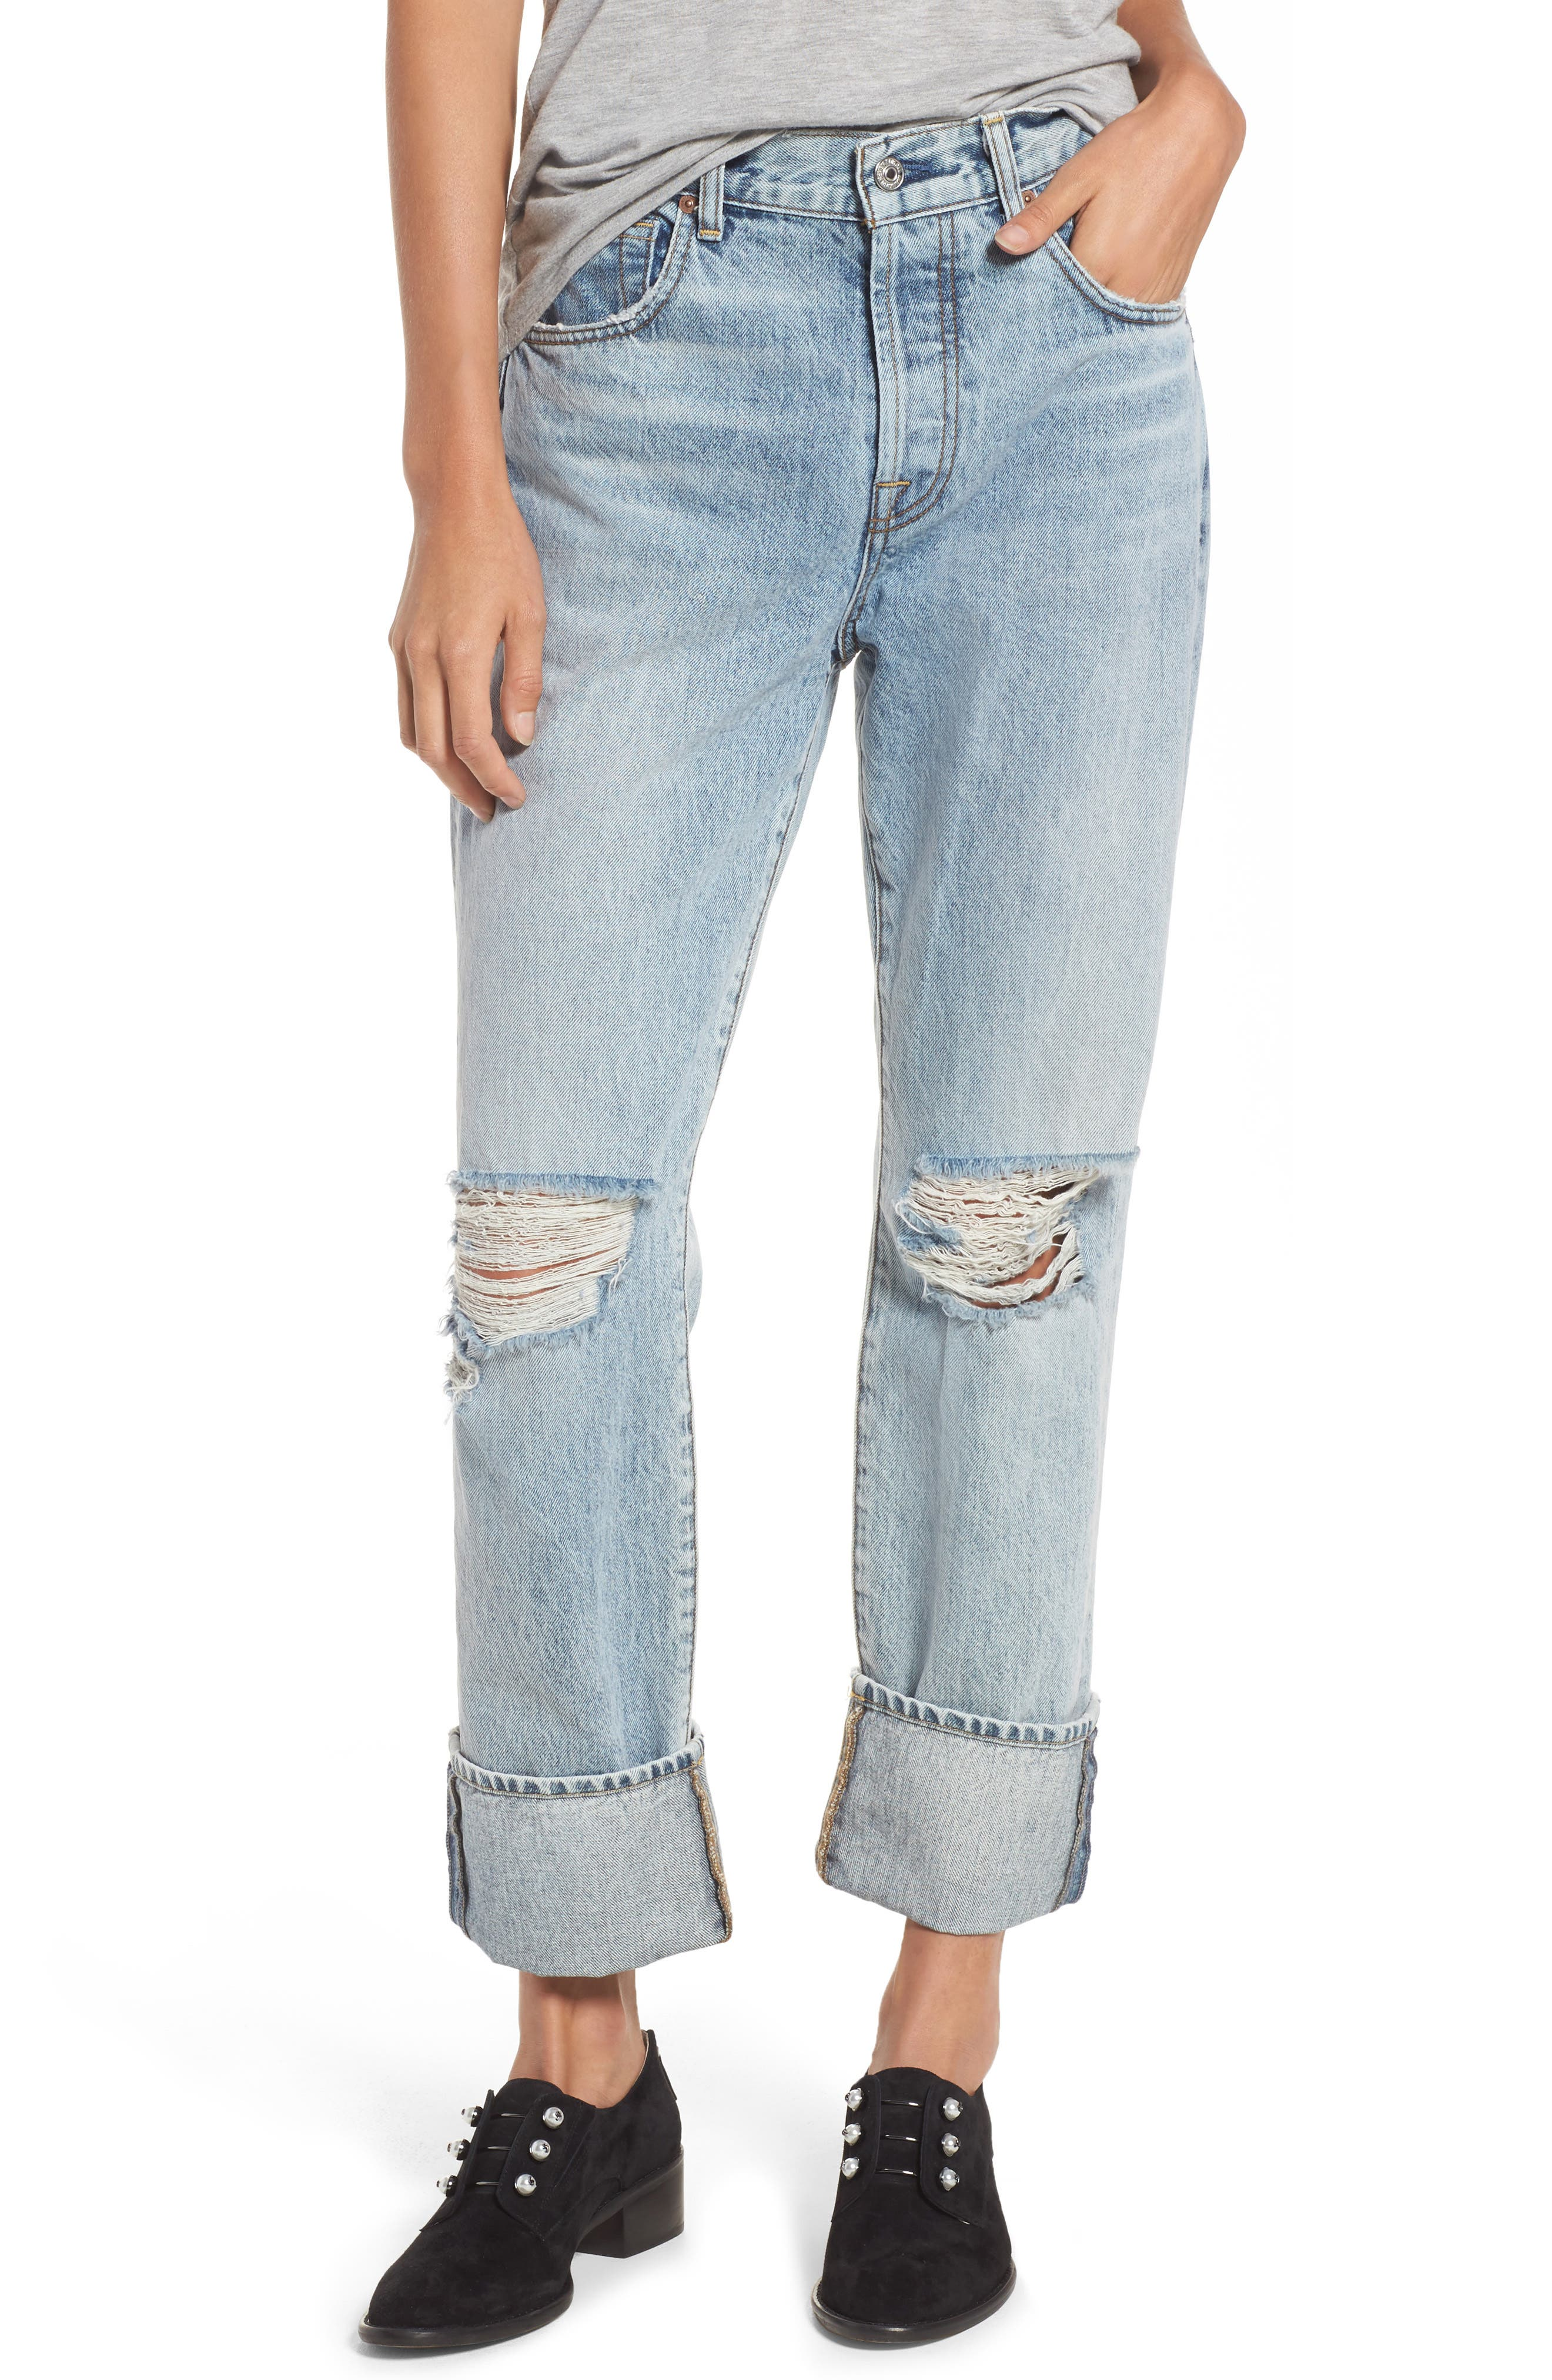 Alternate Image 1 Selected - 7 For All Mankind® Rickie High Waist Boyfriend Jeans (Mineral Desert Springs)